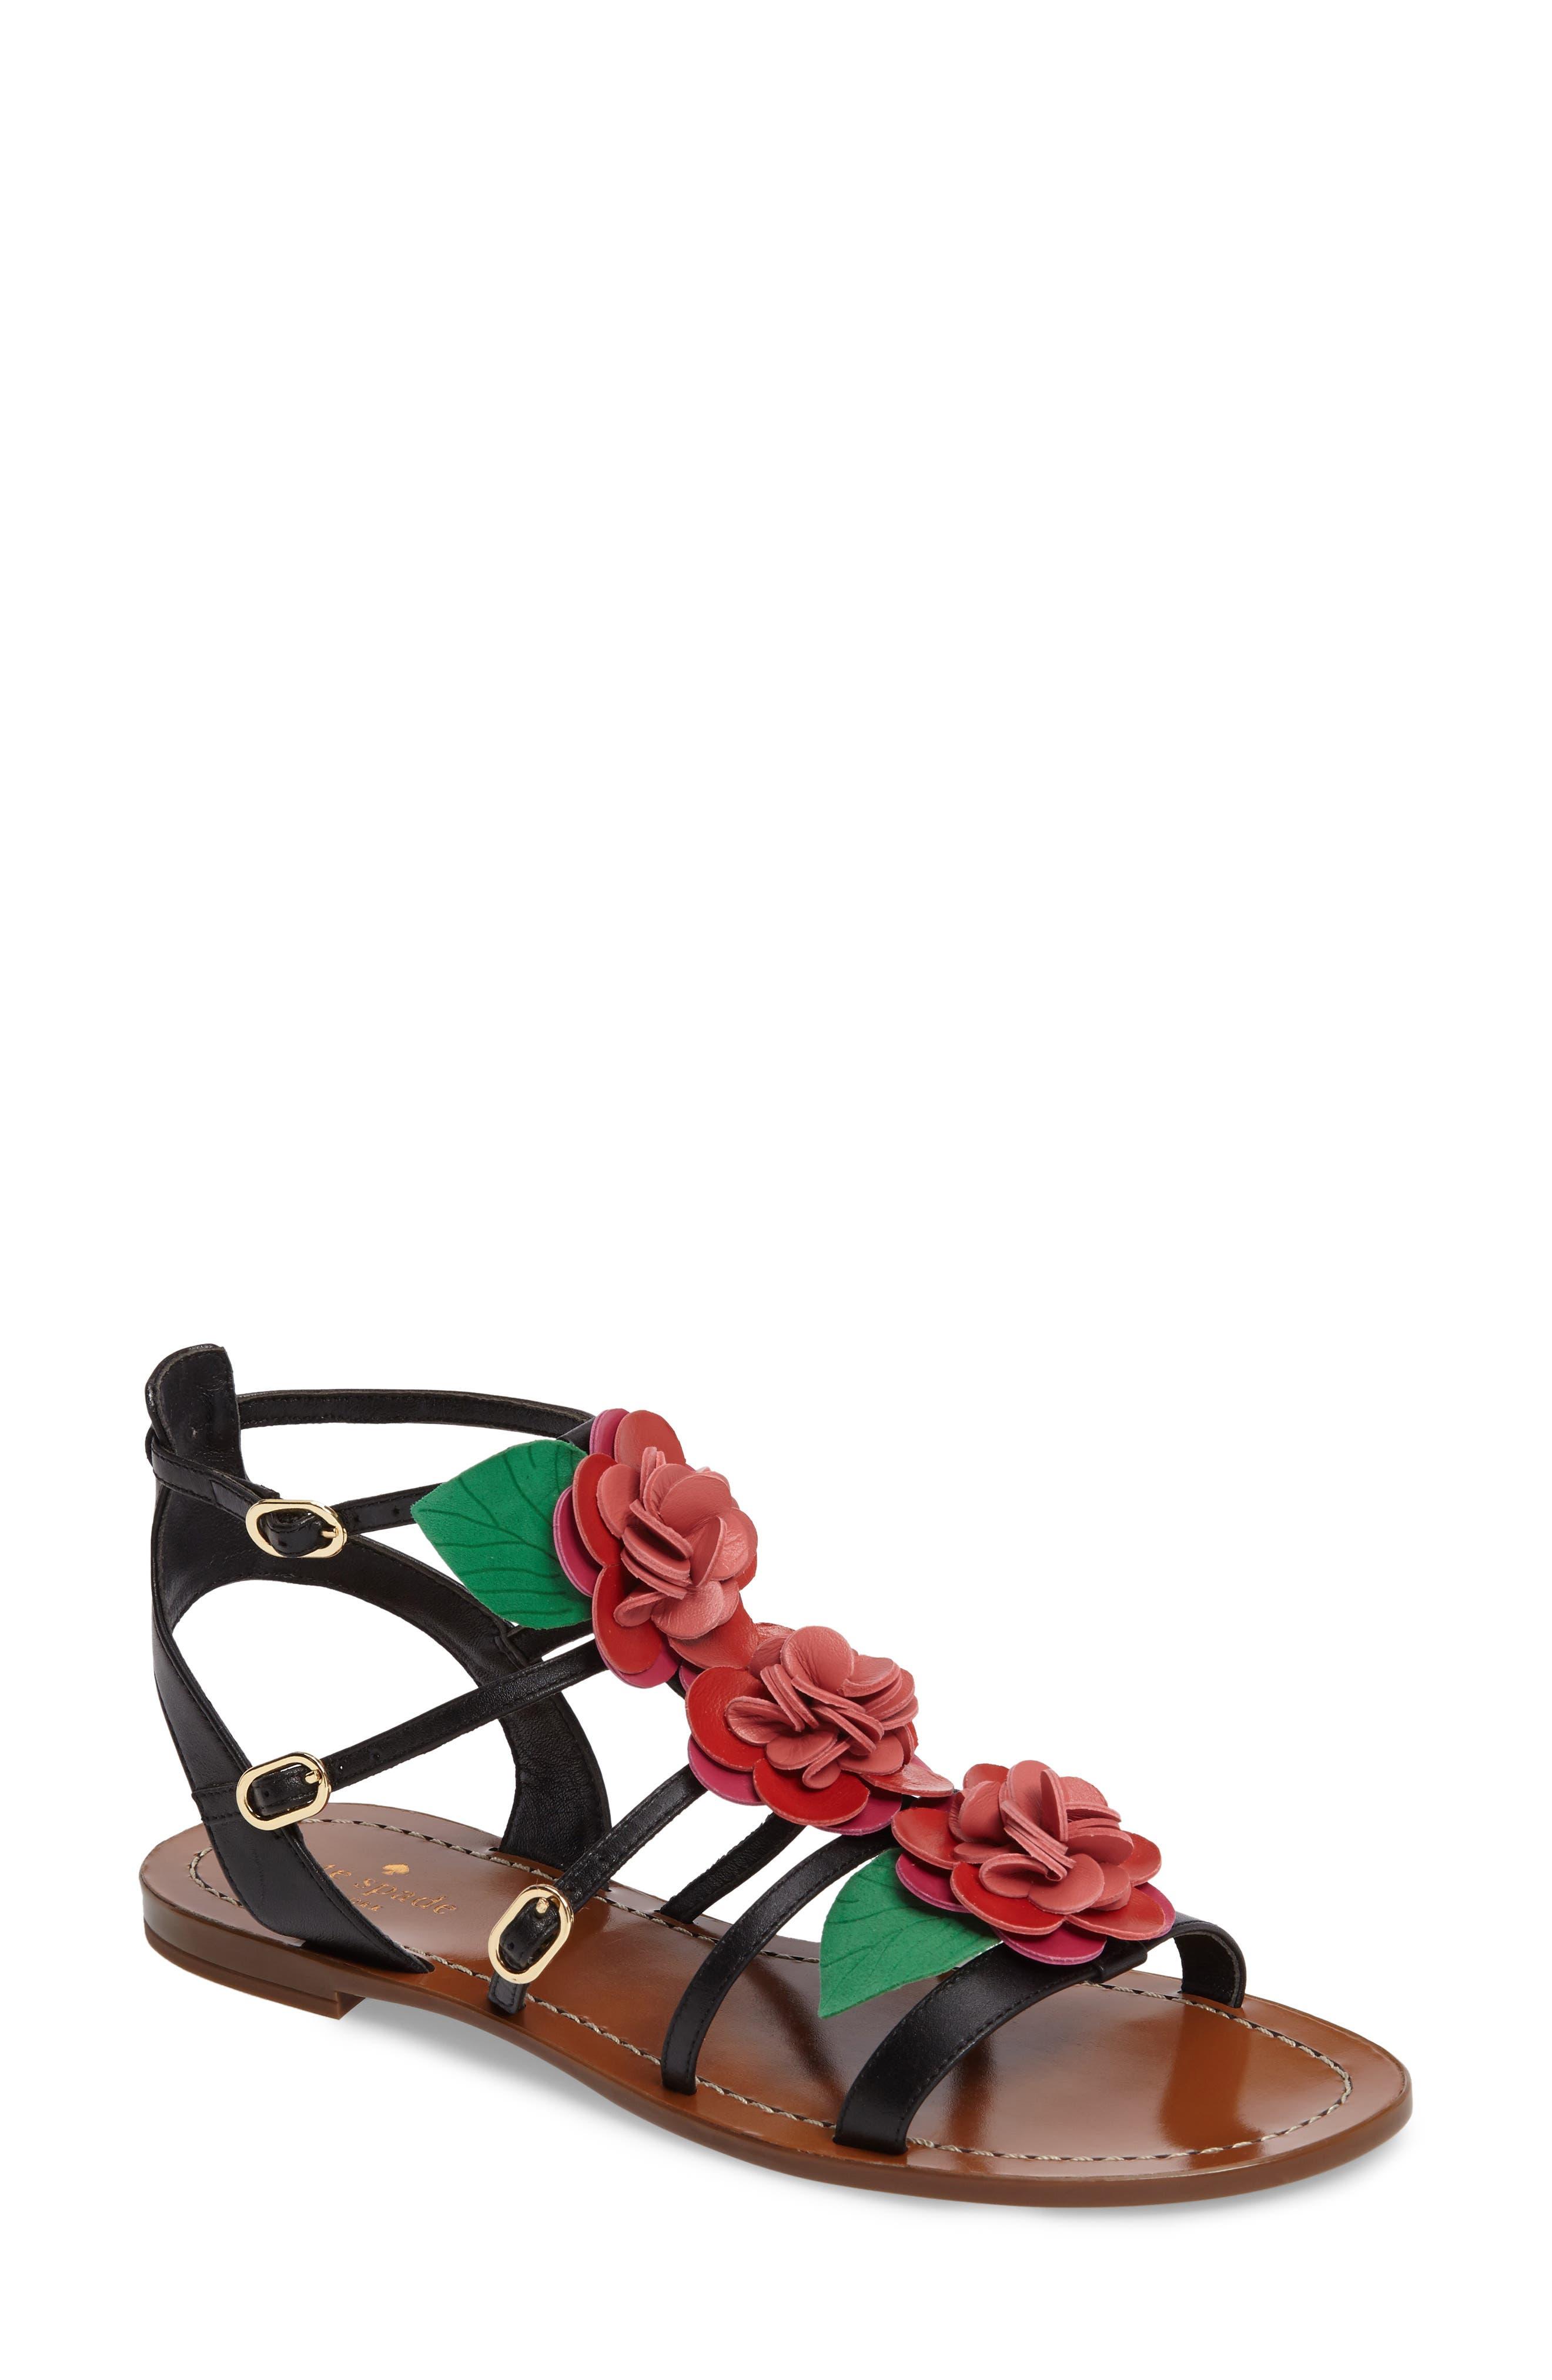 Alternate Image 1 Selected - kate spade new york columbus flat sandal (Women)